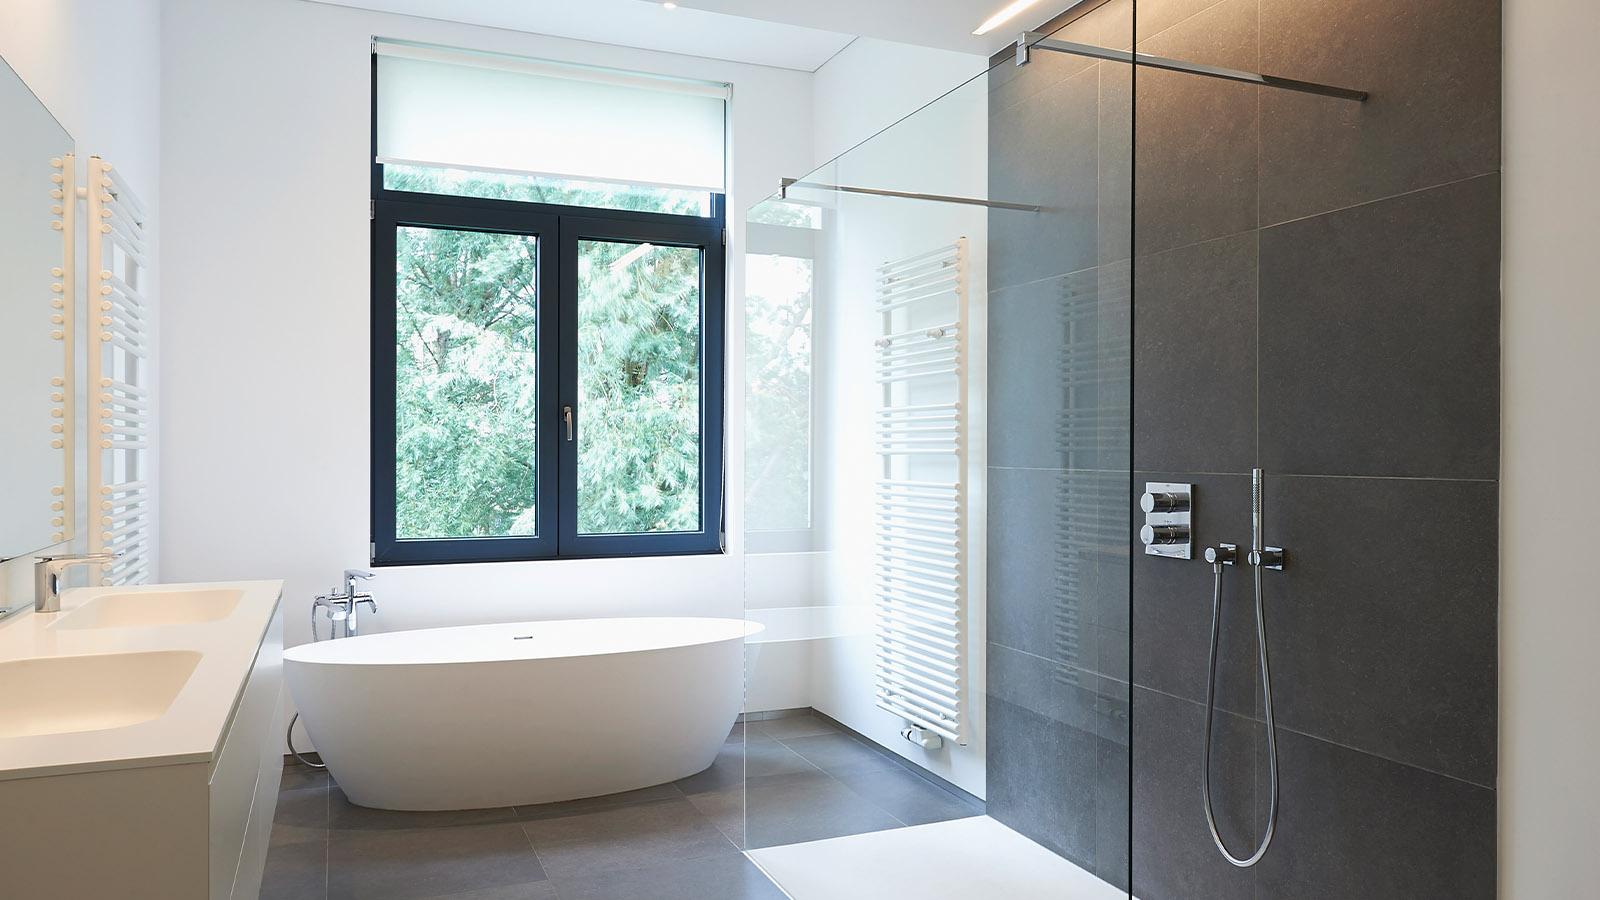 Modernes offenes Badezimmer